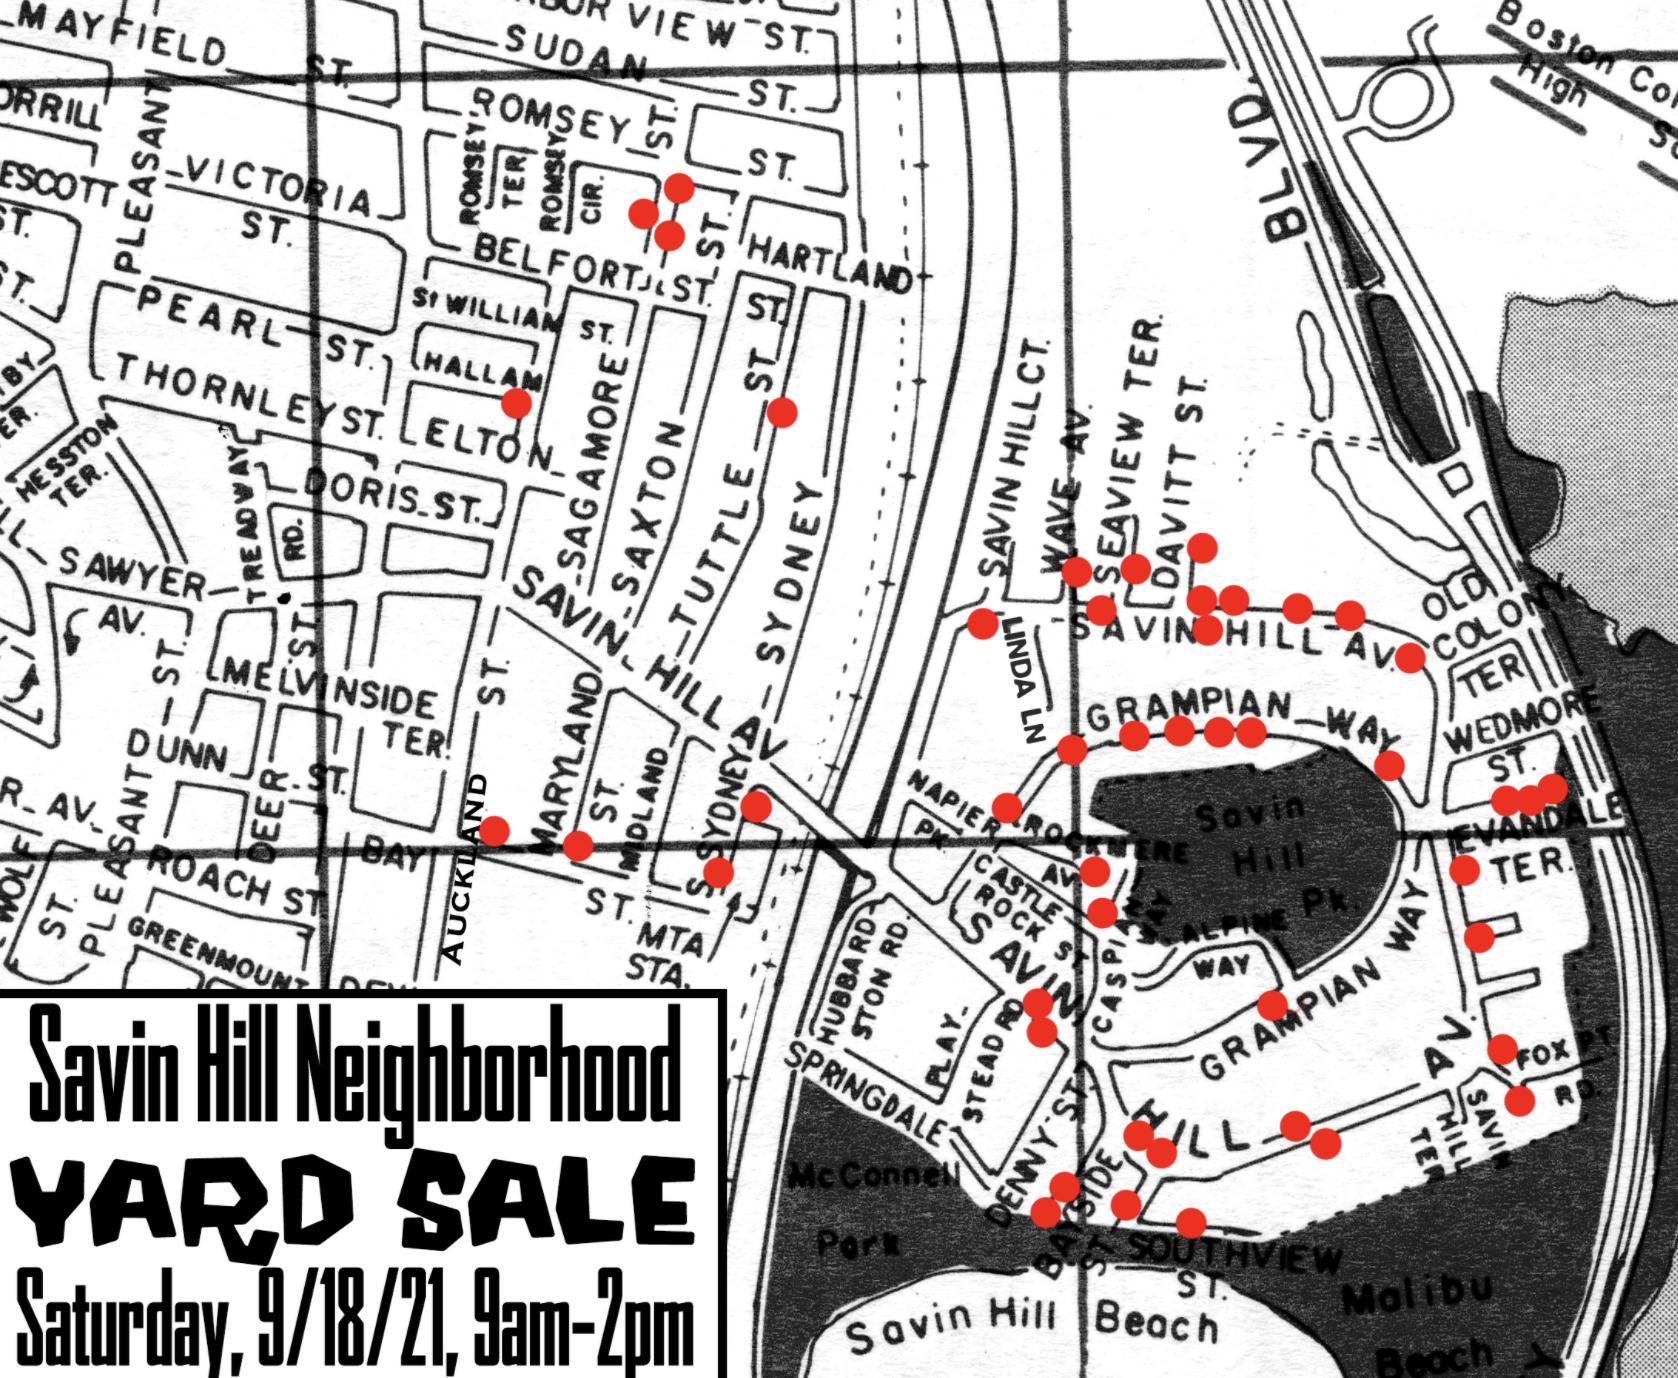 Savin Hill Neighborhood Yard Sale